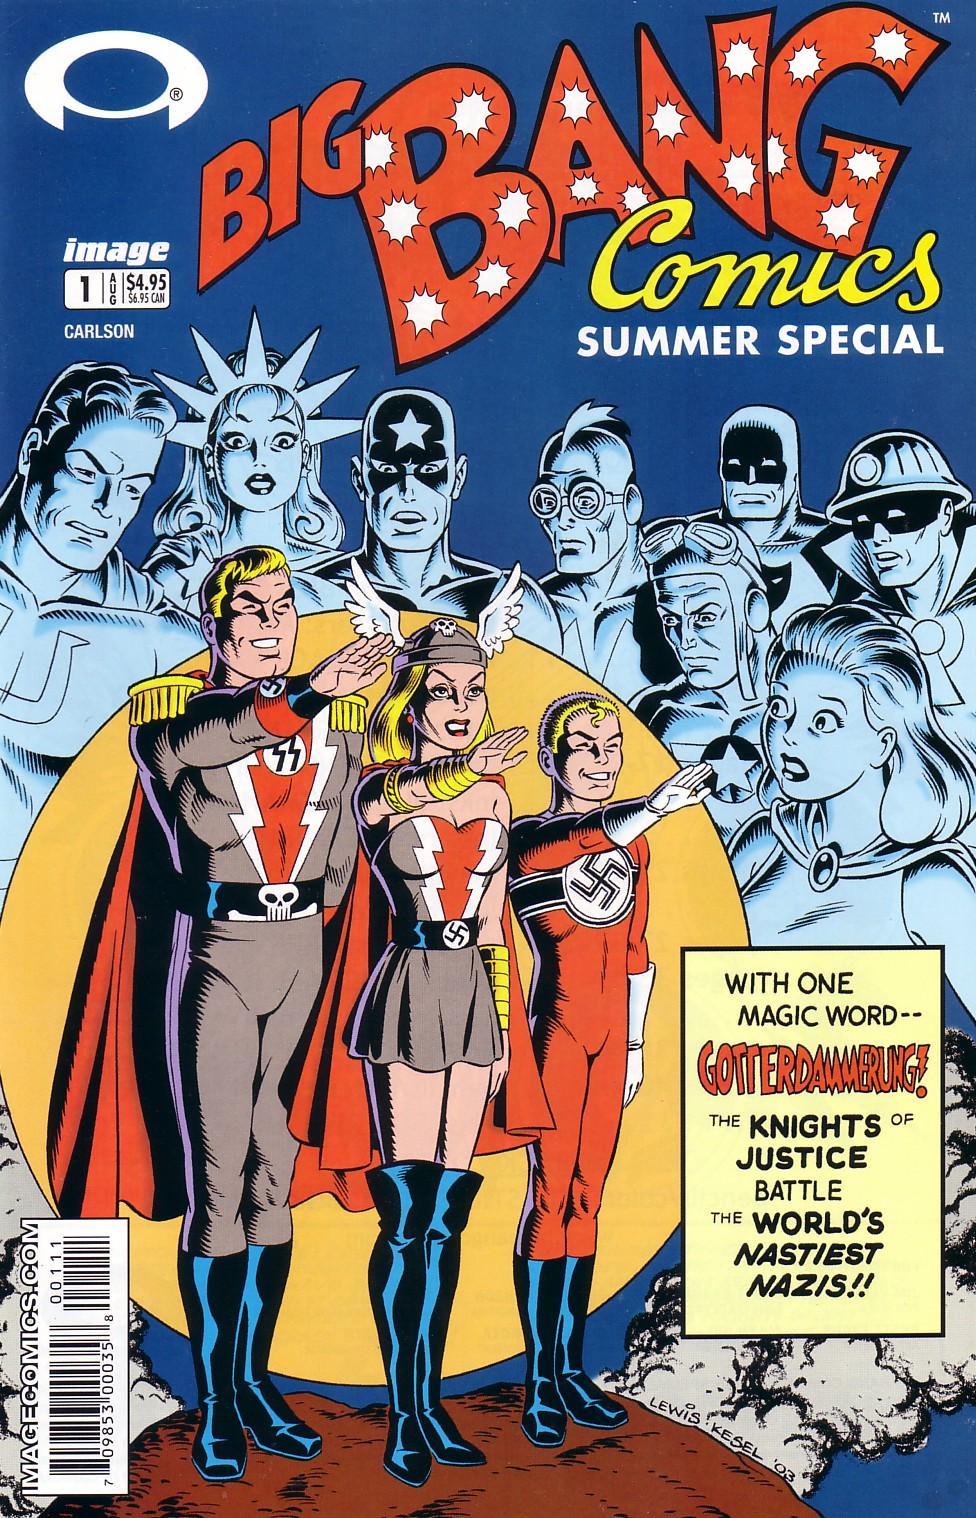 Big Bang Comics Summer Special Full Page 1